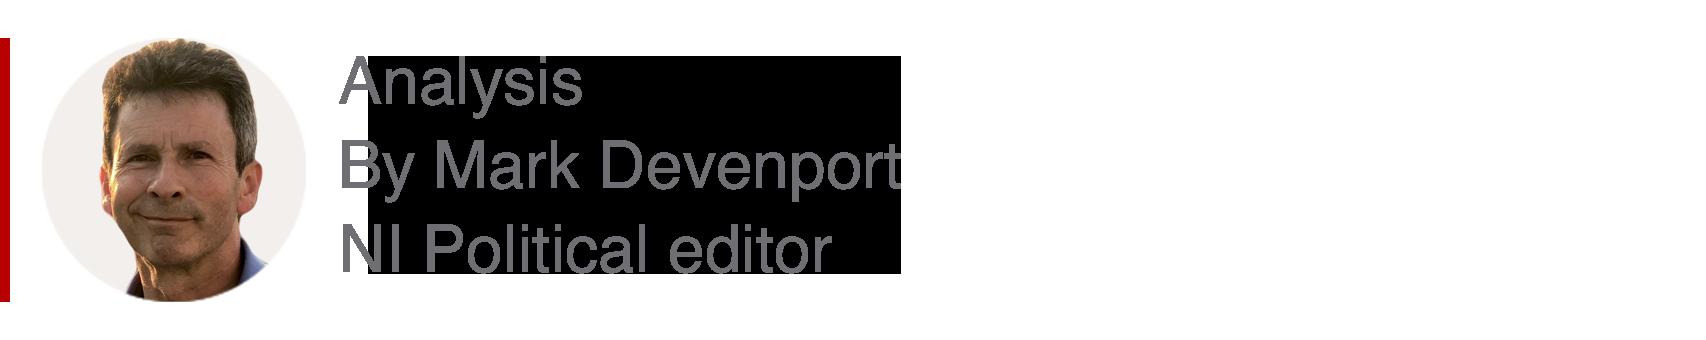 Analysis box by Mark Devenport, NI political editor